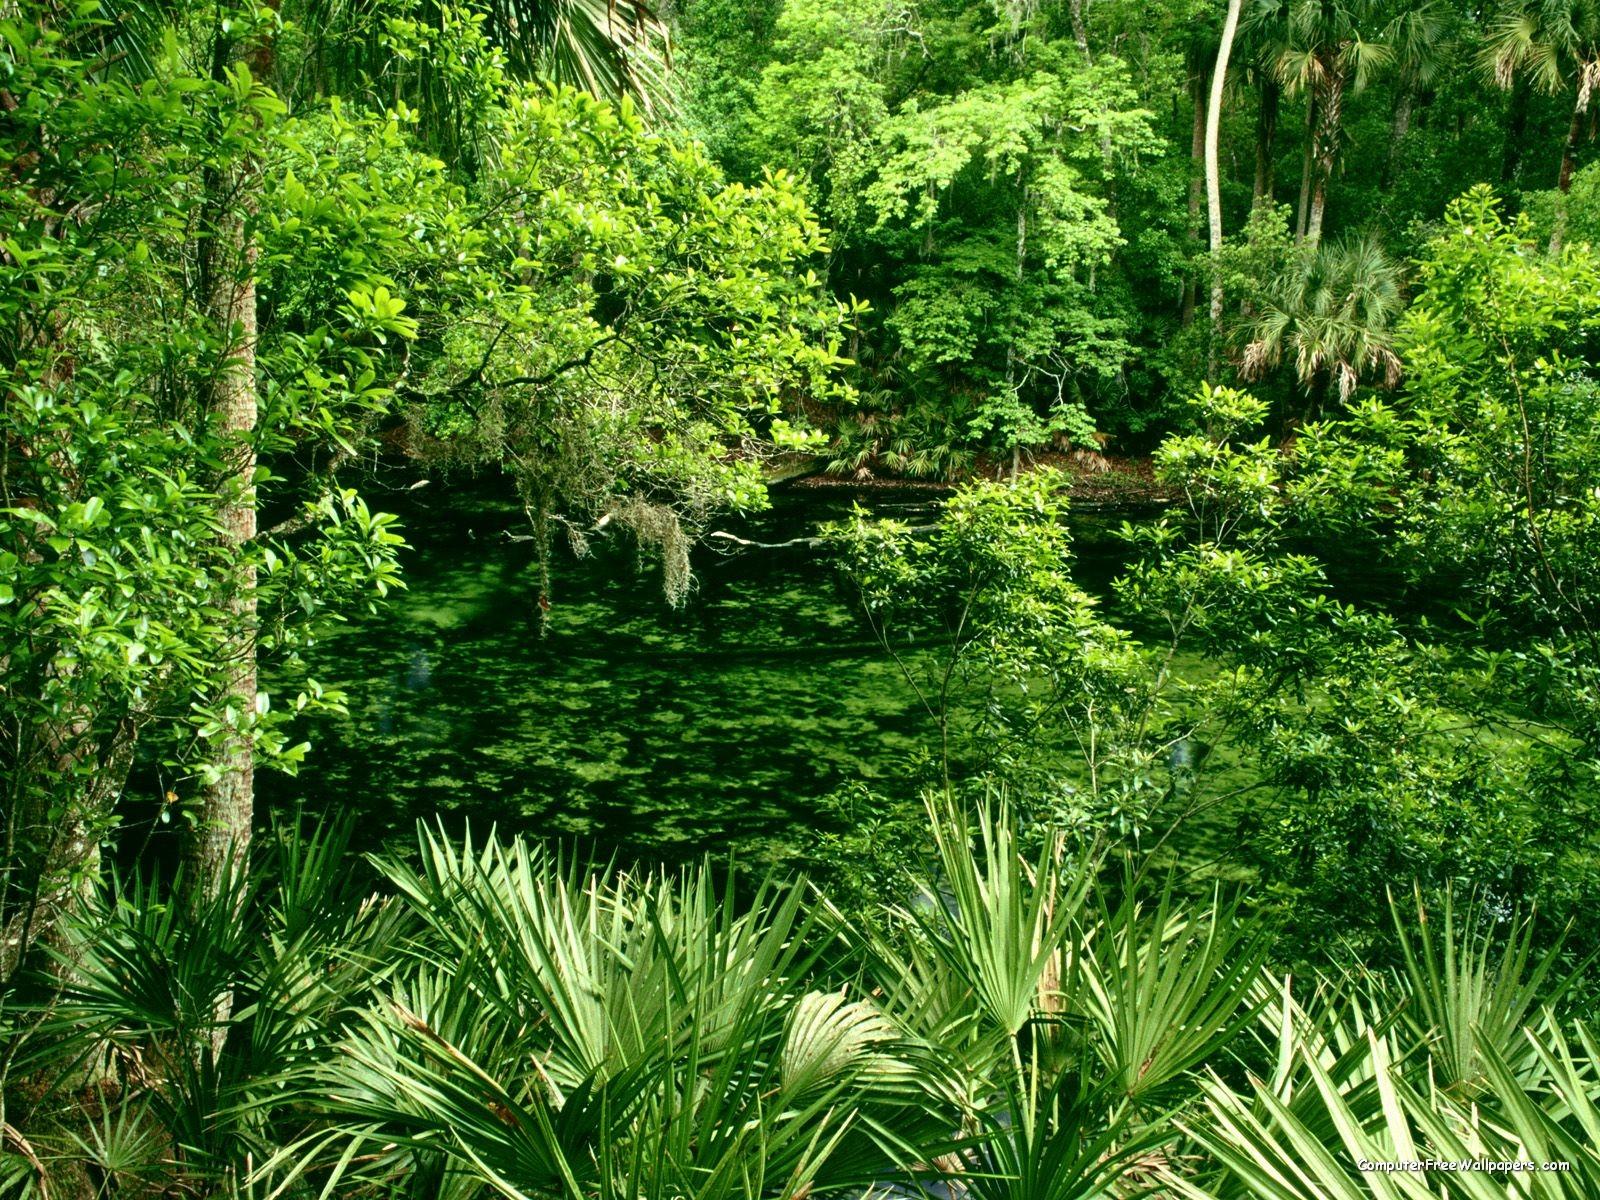 Sfondi natura sfondissimo sfondi screensaver gratis for Immagini desktop natura